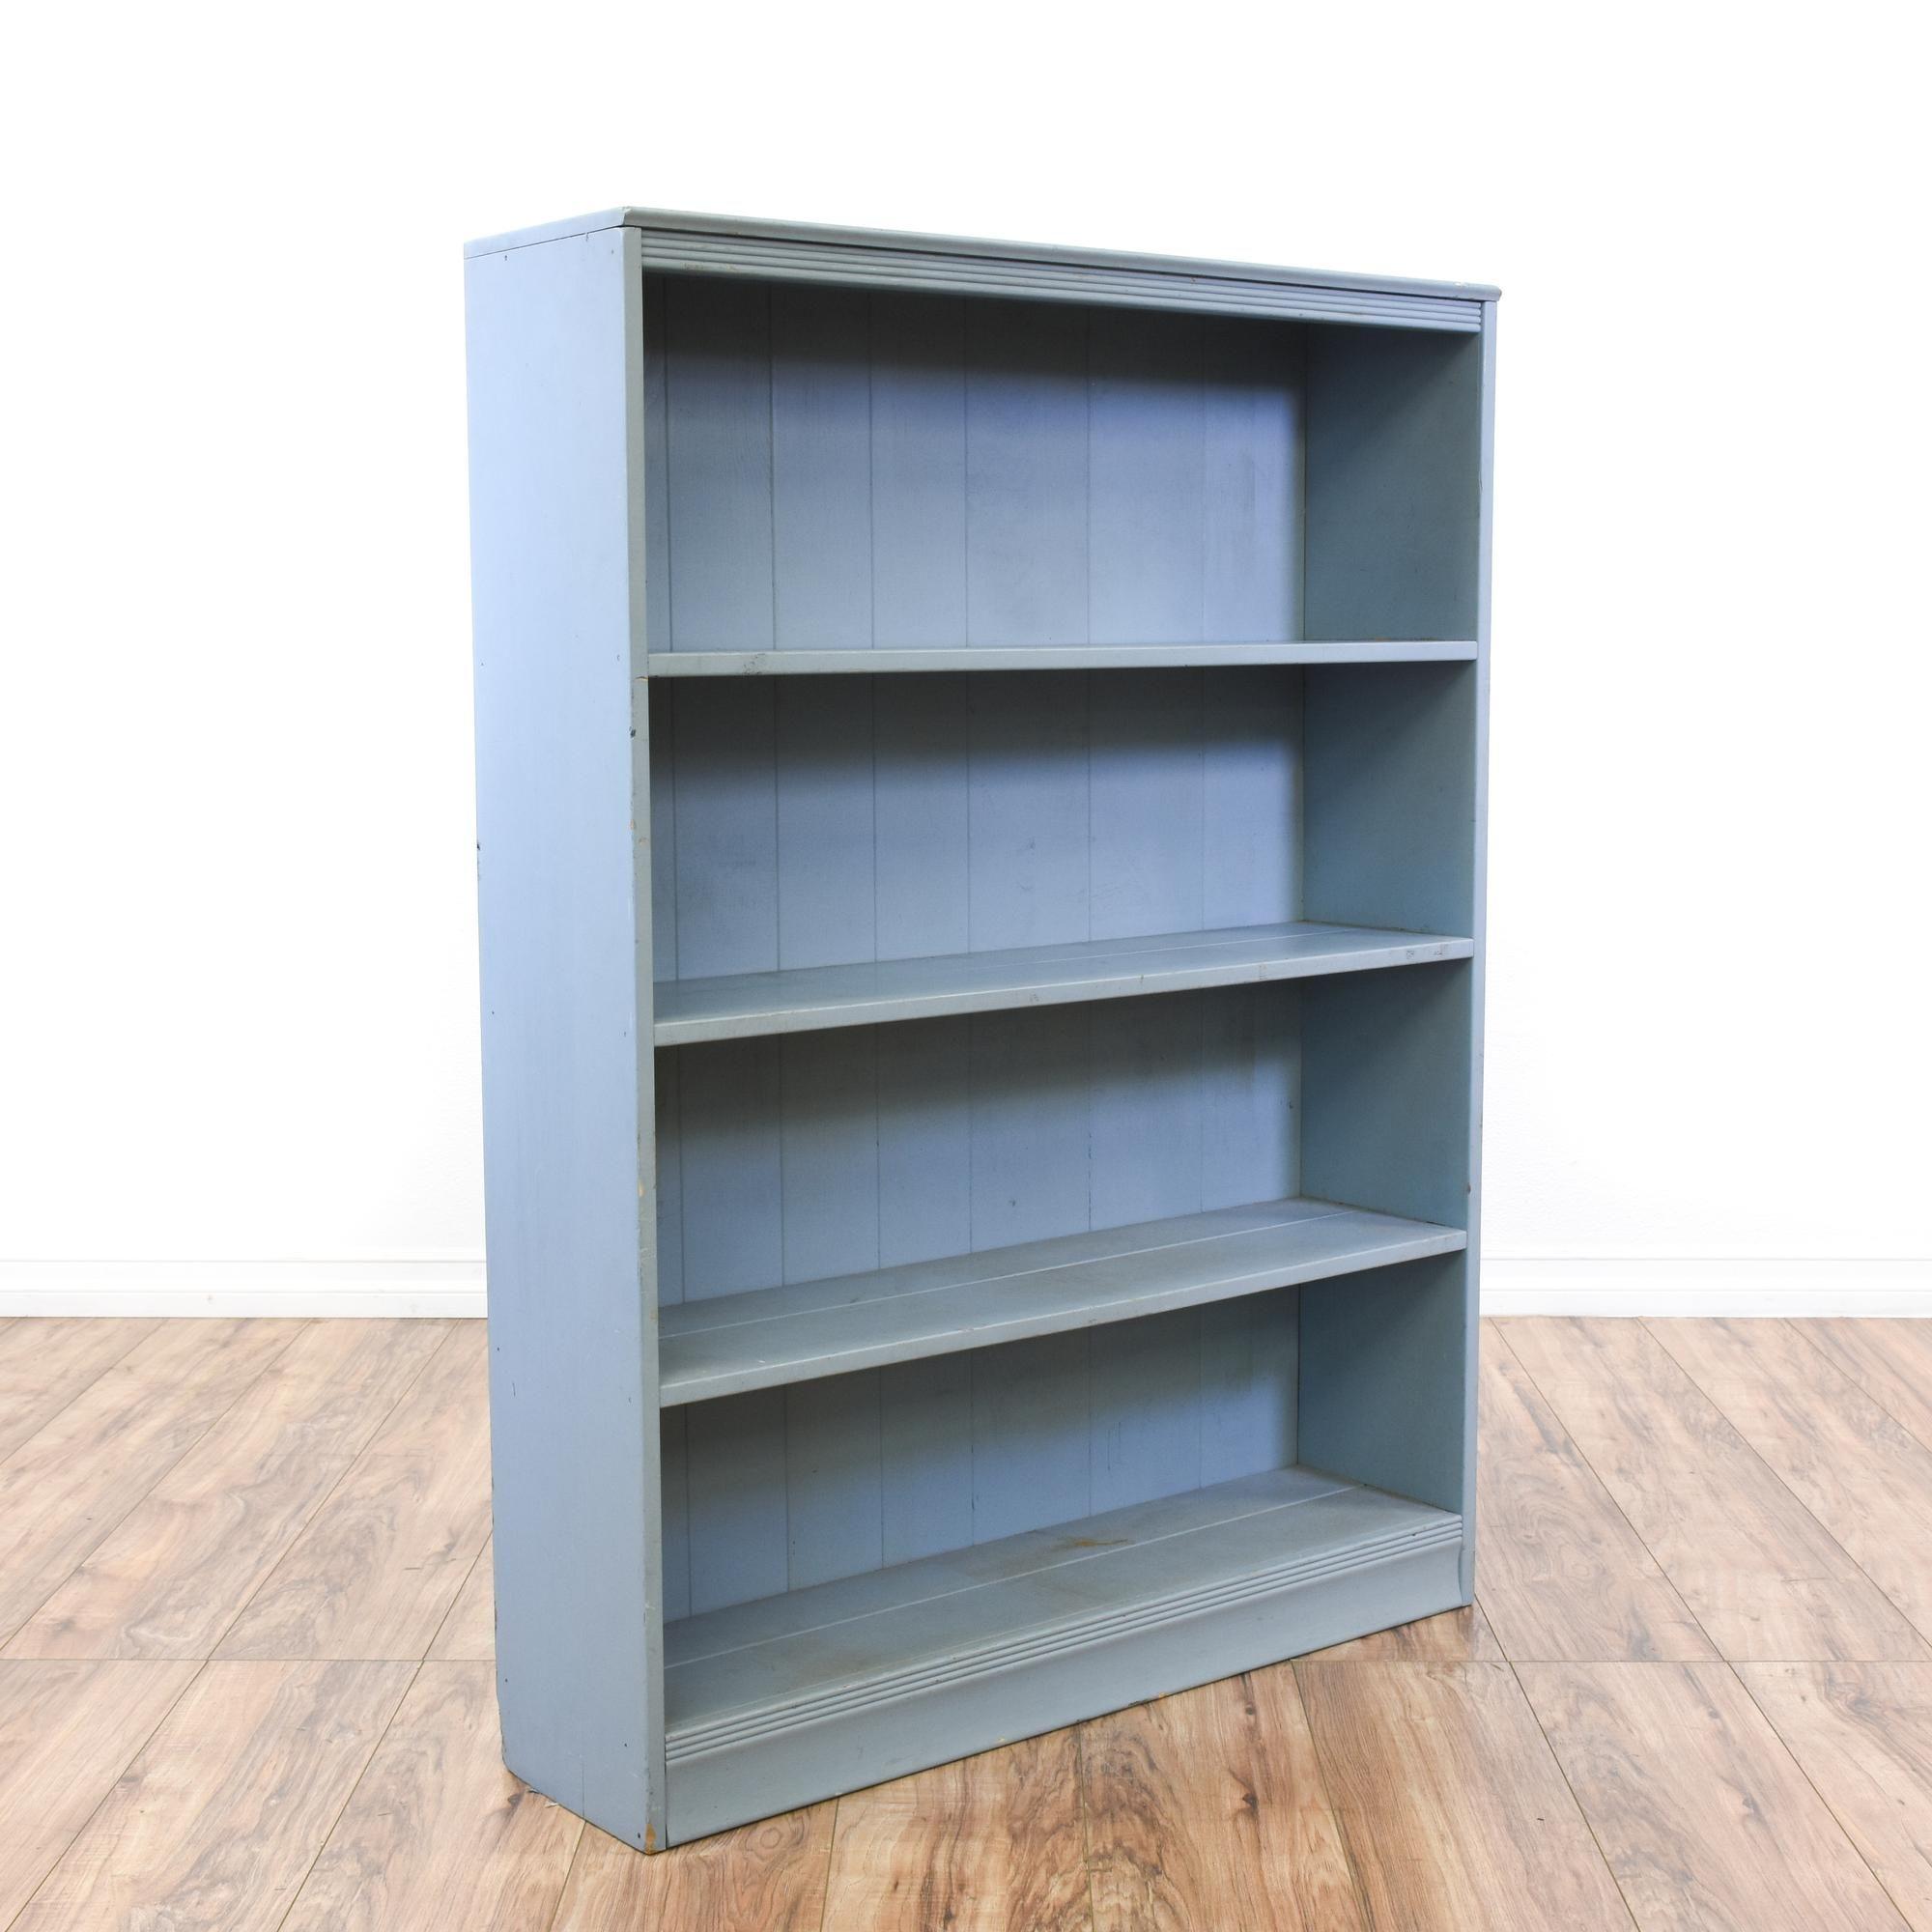 bookshelf cottage garden bookcase overstock storage multi today bookcases america free furniture open home shipping of white product miranda